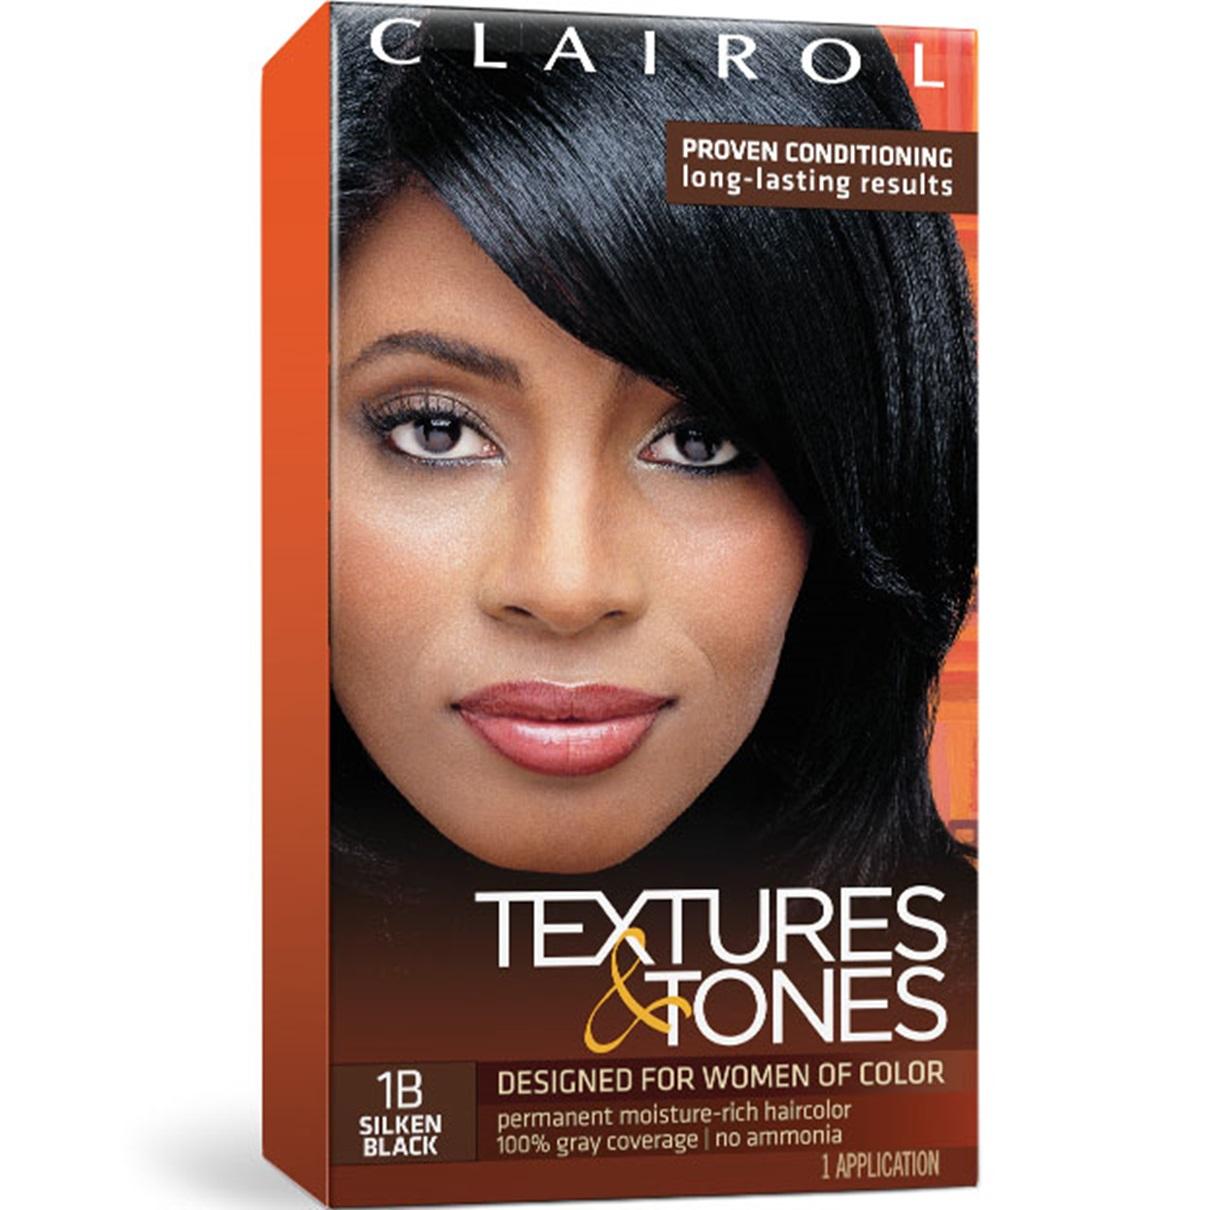 Clairol Textures Tones Permanent Hair Color Dye Kit 1 Application